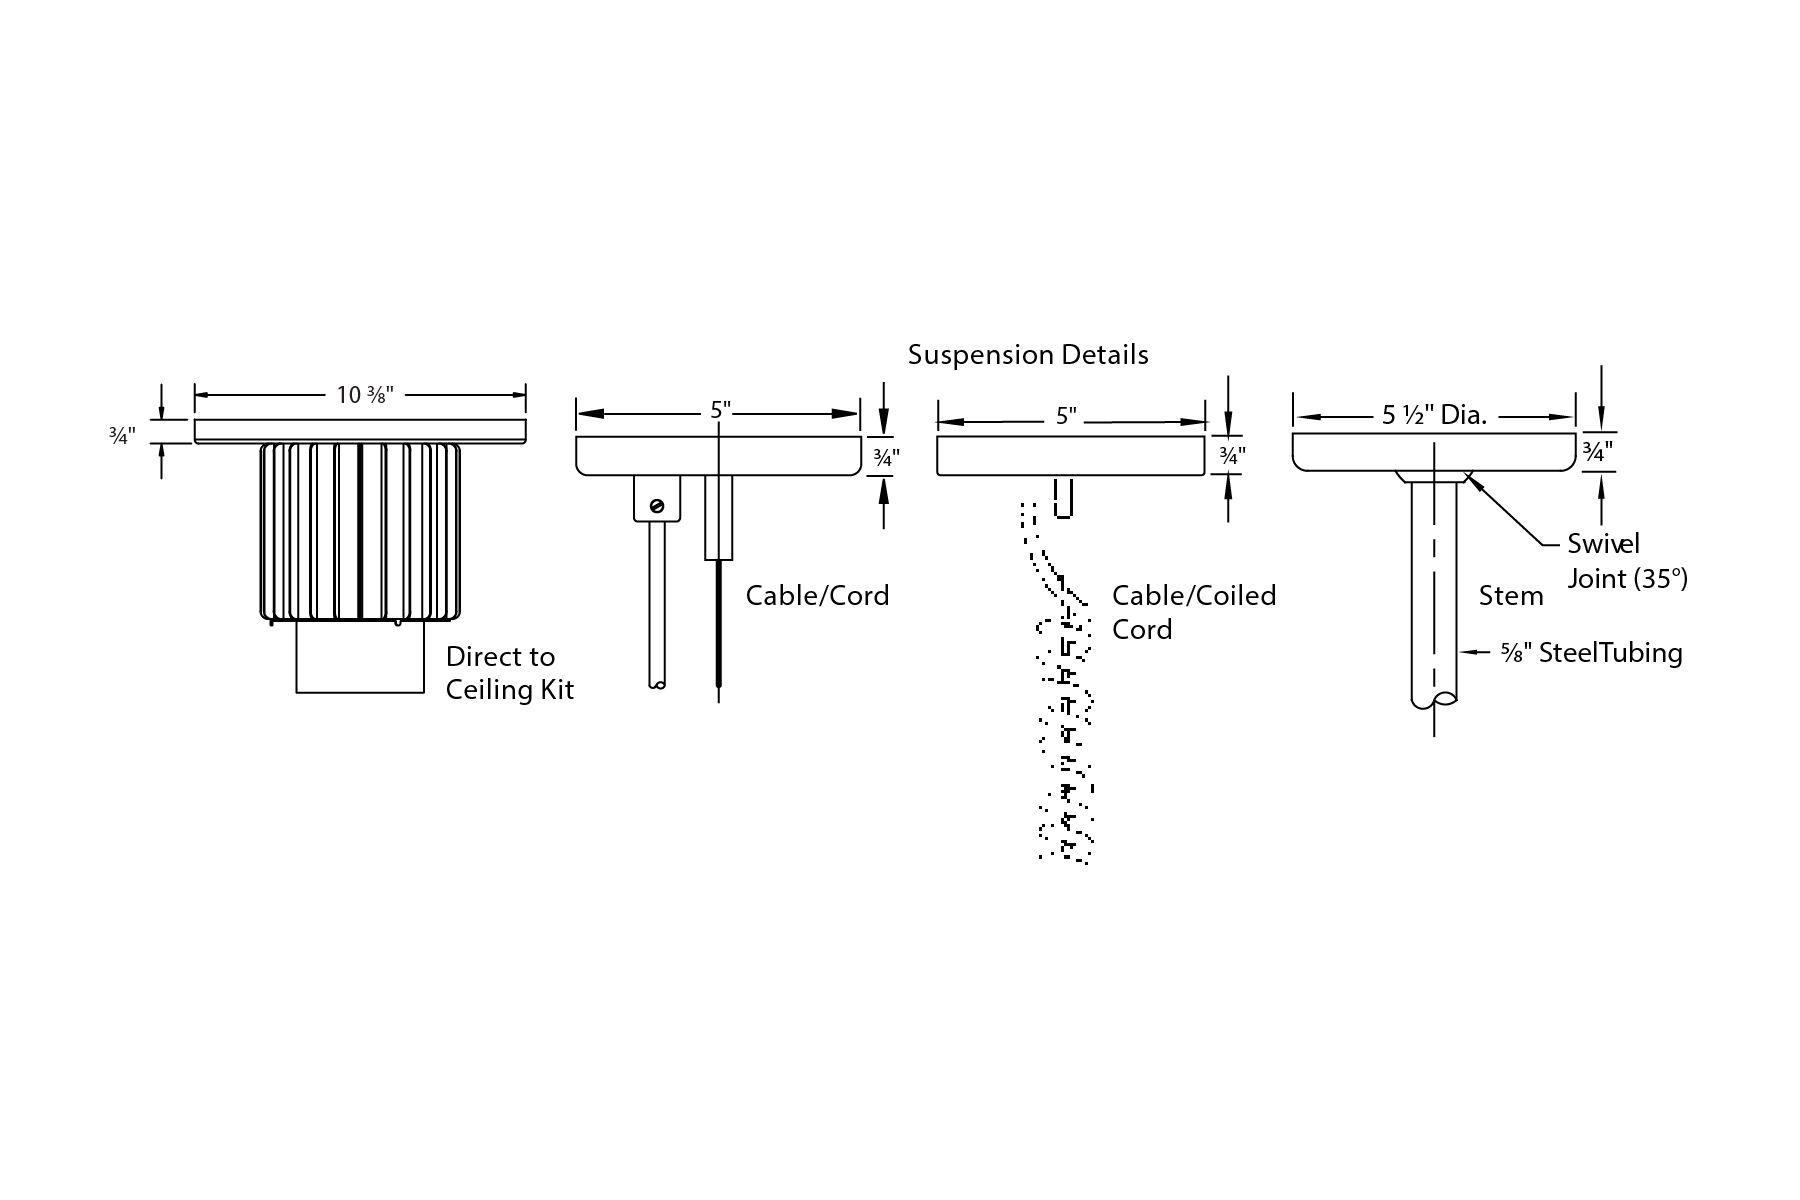 Philips Day Brite Lw27u Pendalyte 12 Inch 30 Watt K Led High Bay Pendant Light Fixture